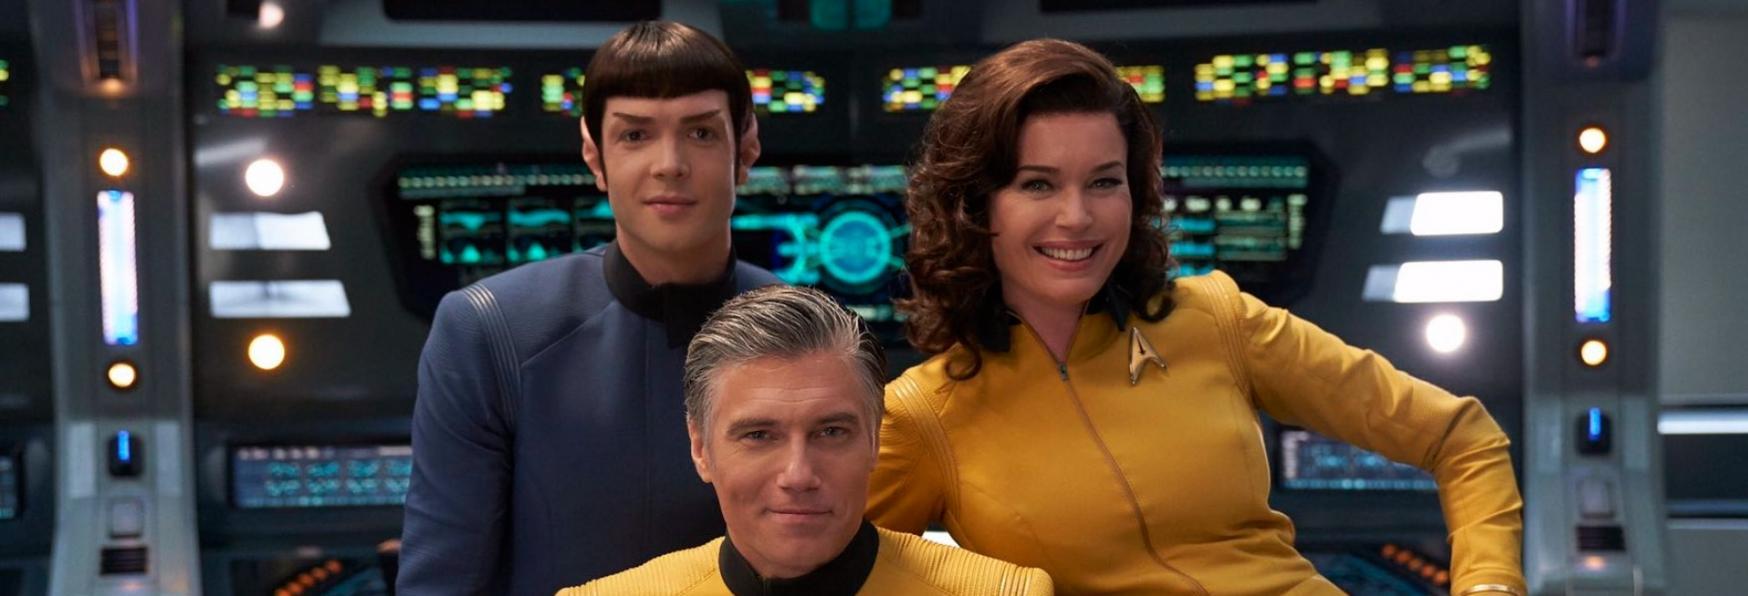 Star Trek: Strange New Worlds - Cast in Quarantena per una Guest Star positiva al Covid-19